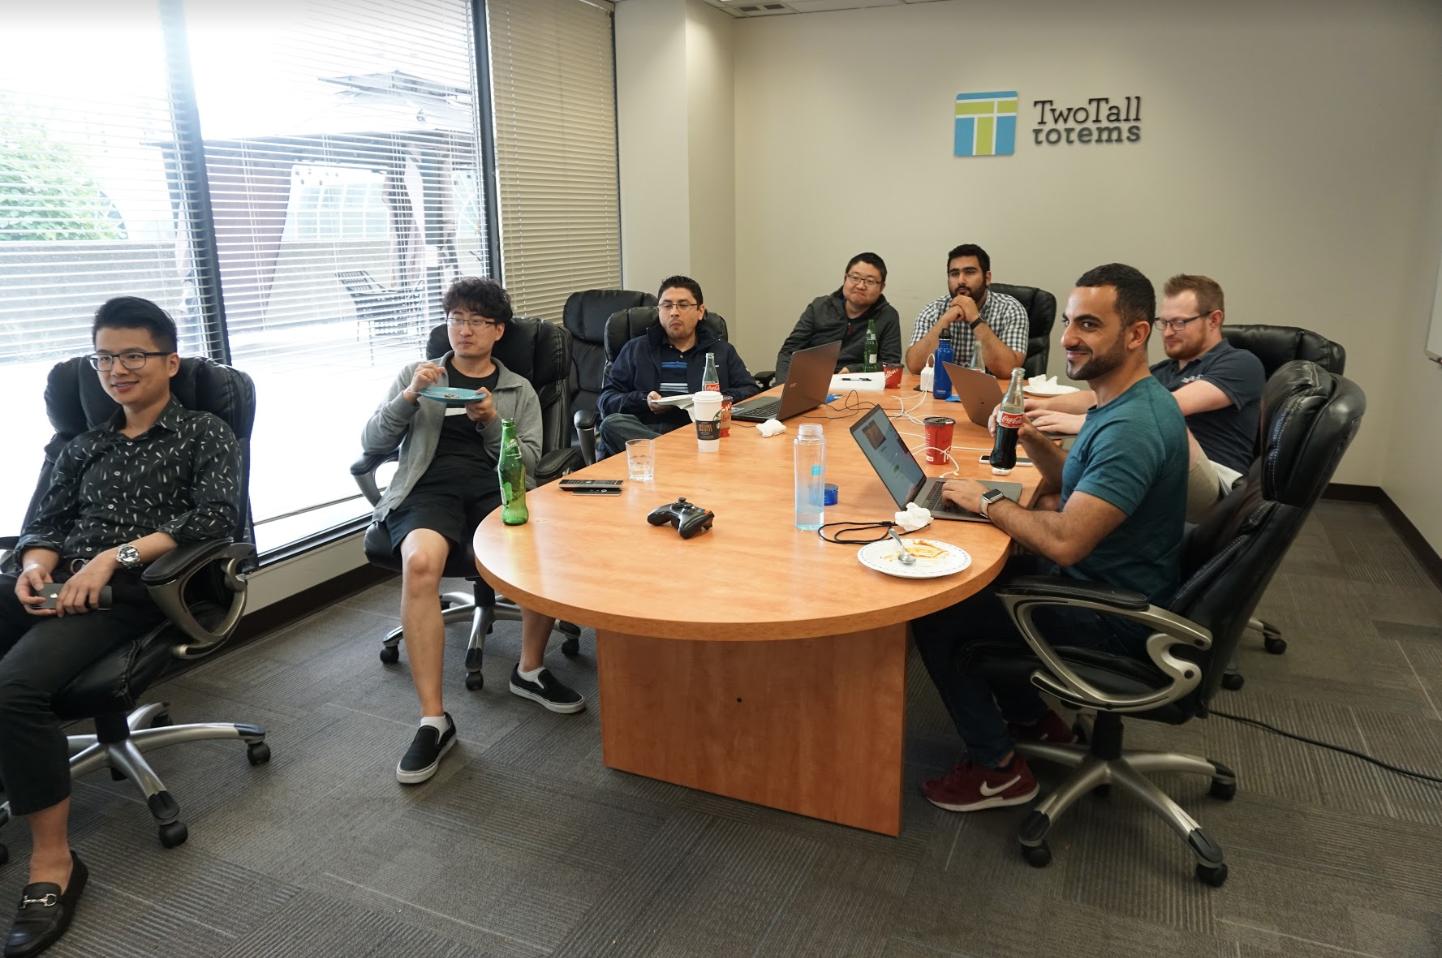 TTT team watching hackathon presentation in boardroom